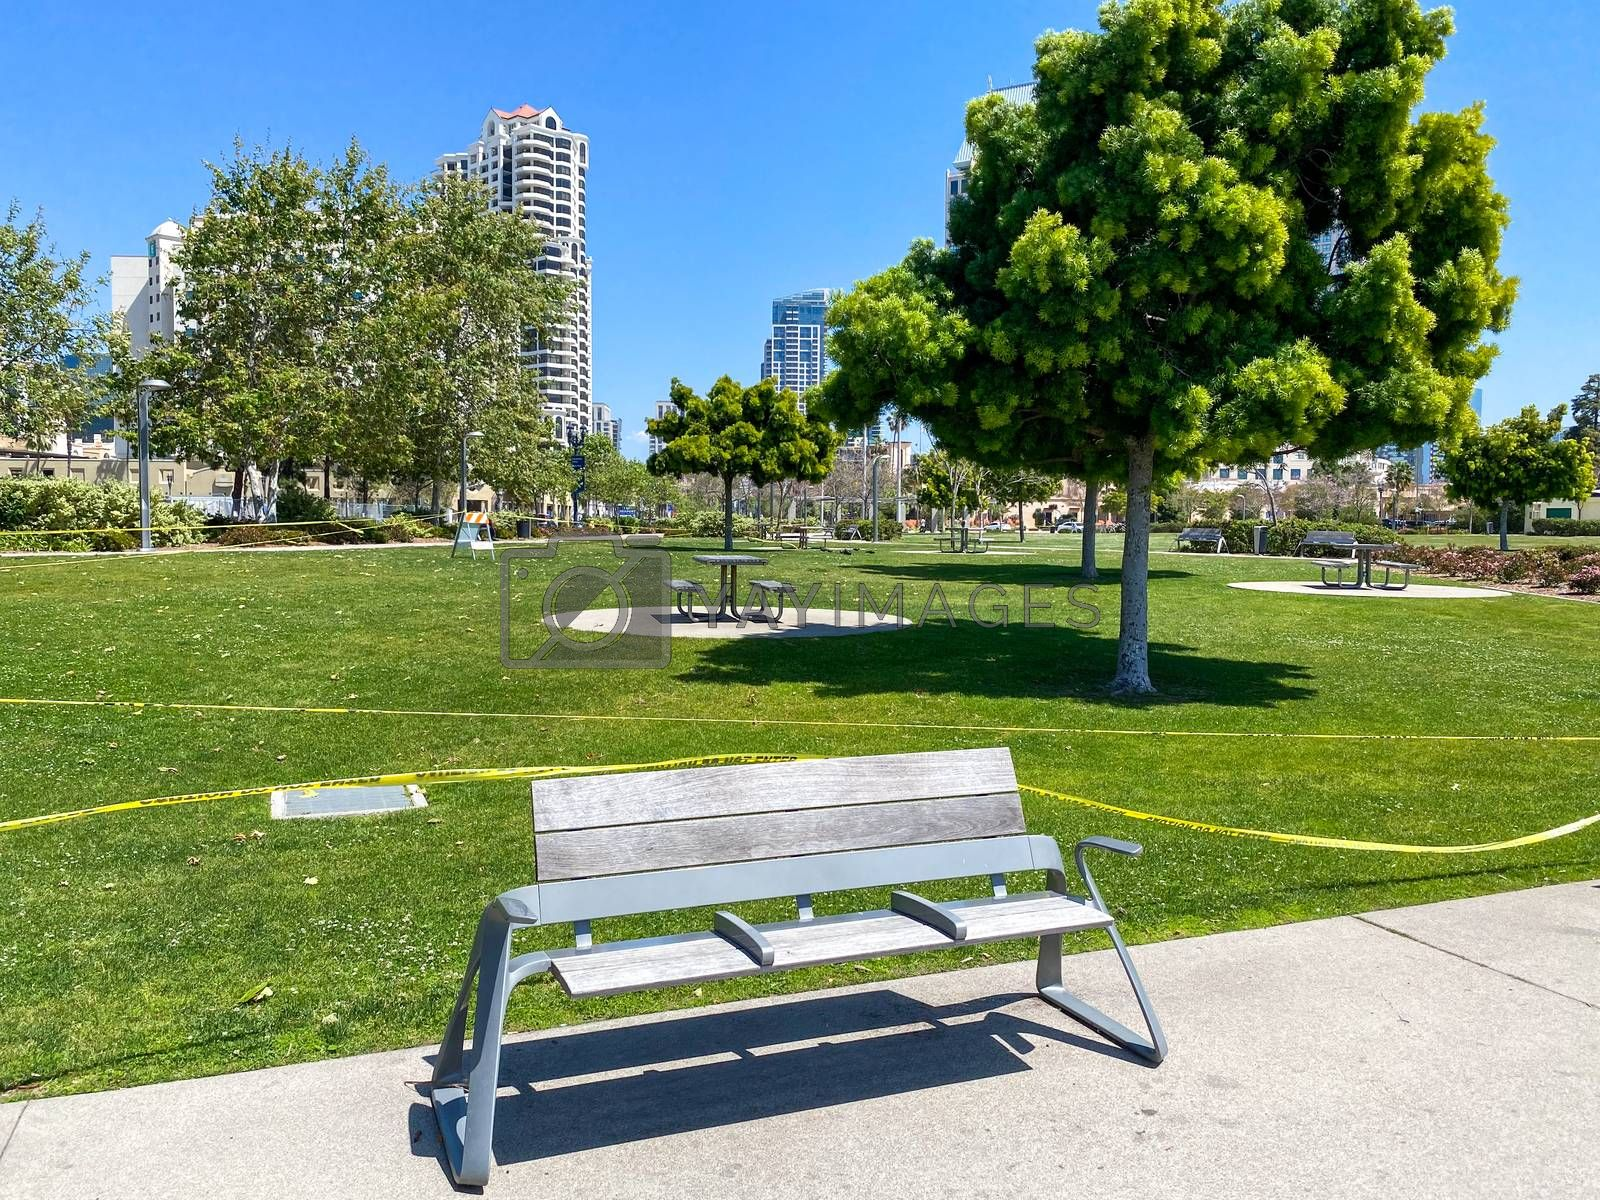 Empty and closed park during COVID-19 pandemic. . Coronavirus virus panic and quarantine San Diego, USA, April 18th, 2020